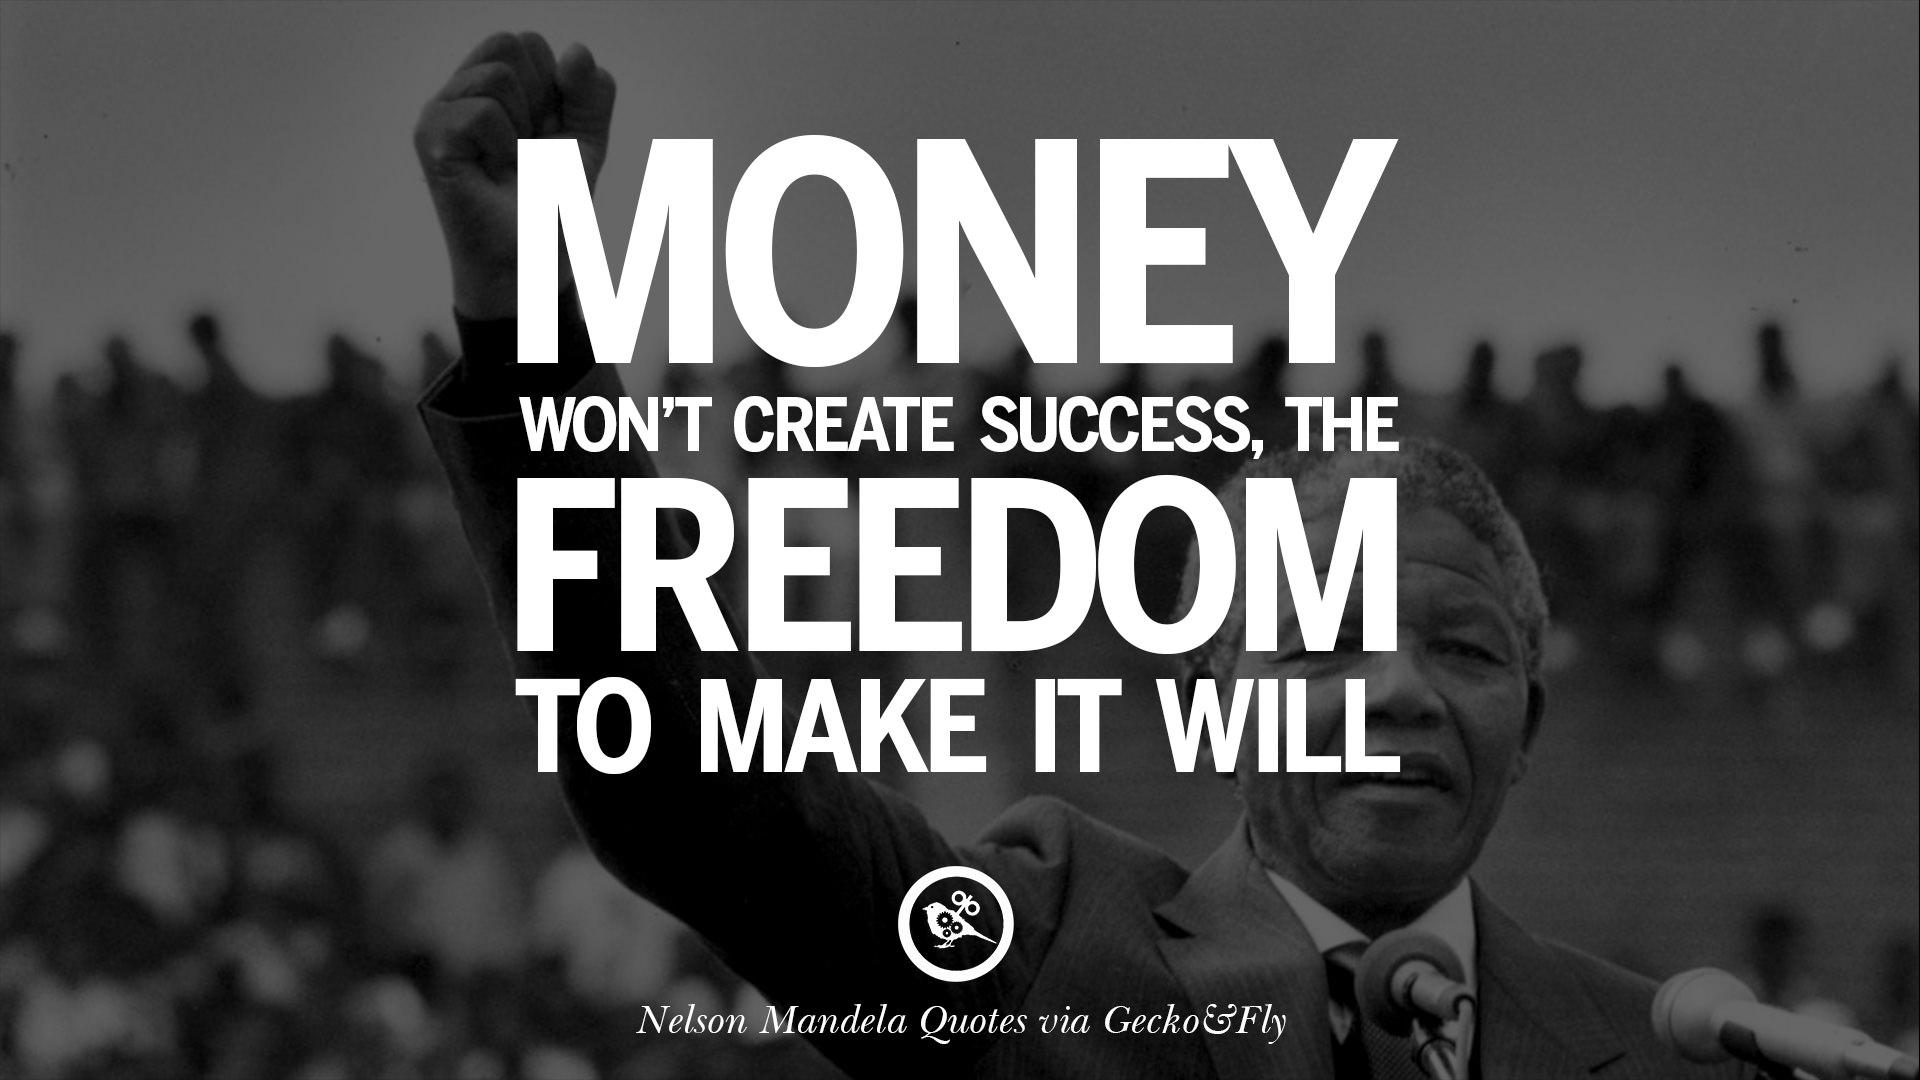 Citaten Nelson Mandela : Nelson mandela quotes on education leadership quotes update